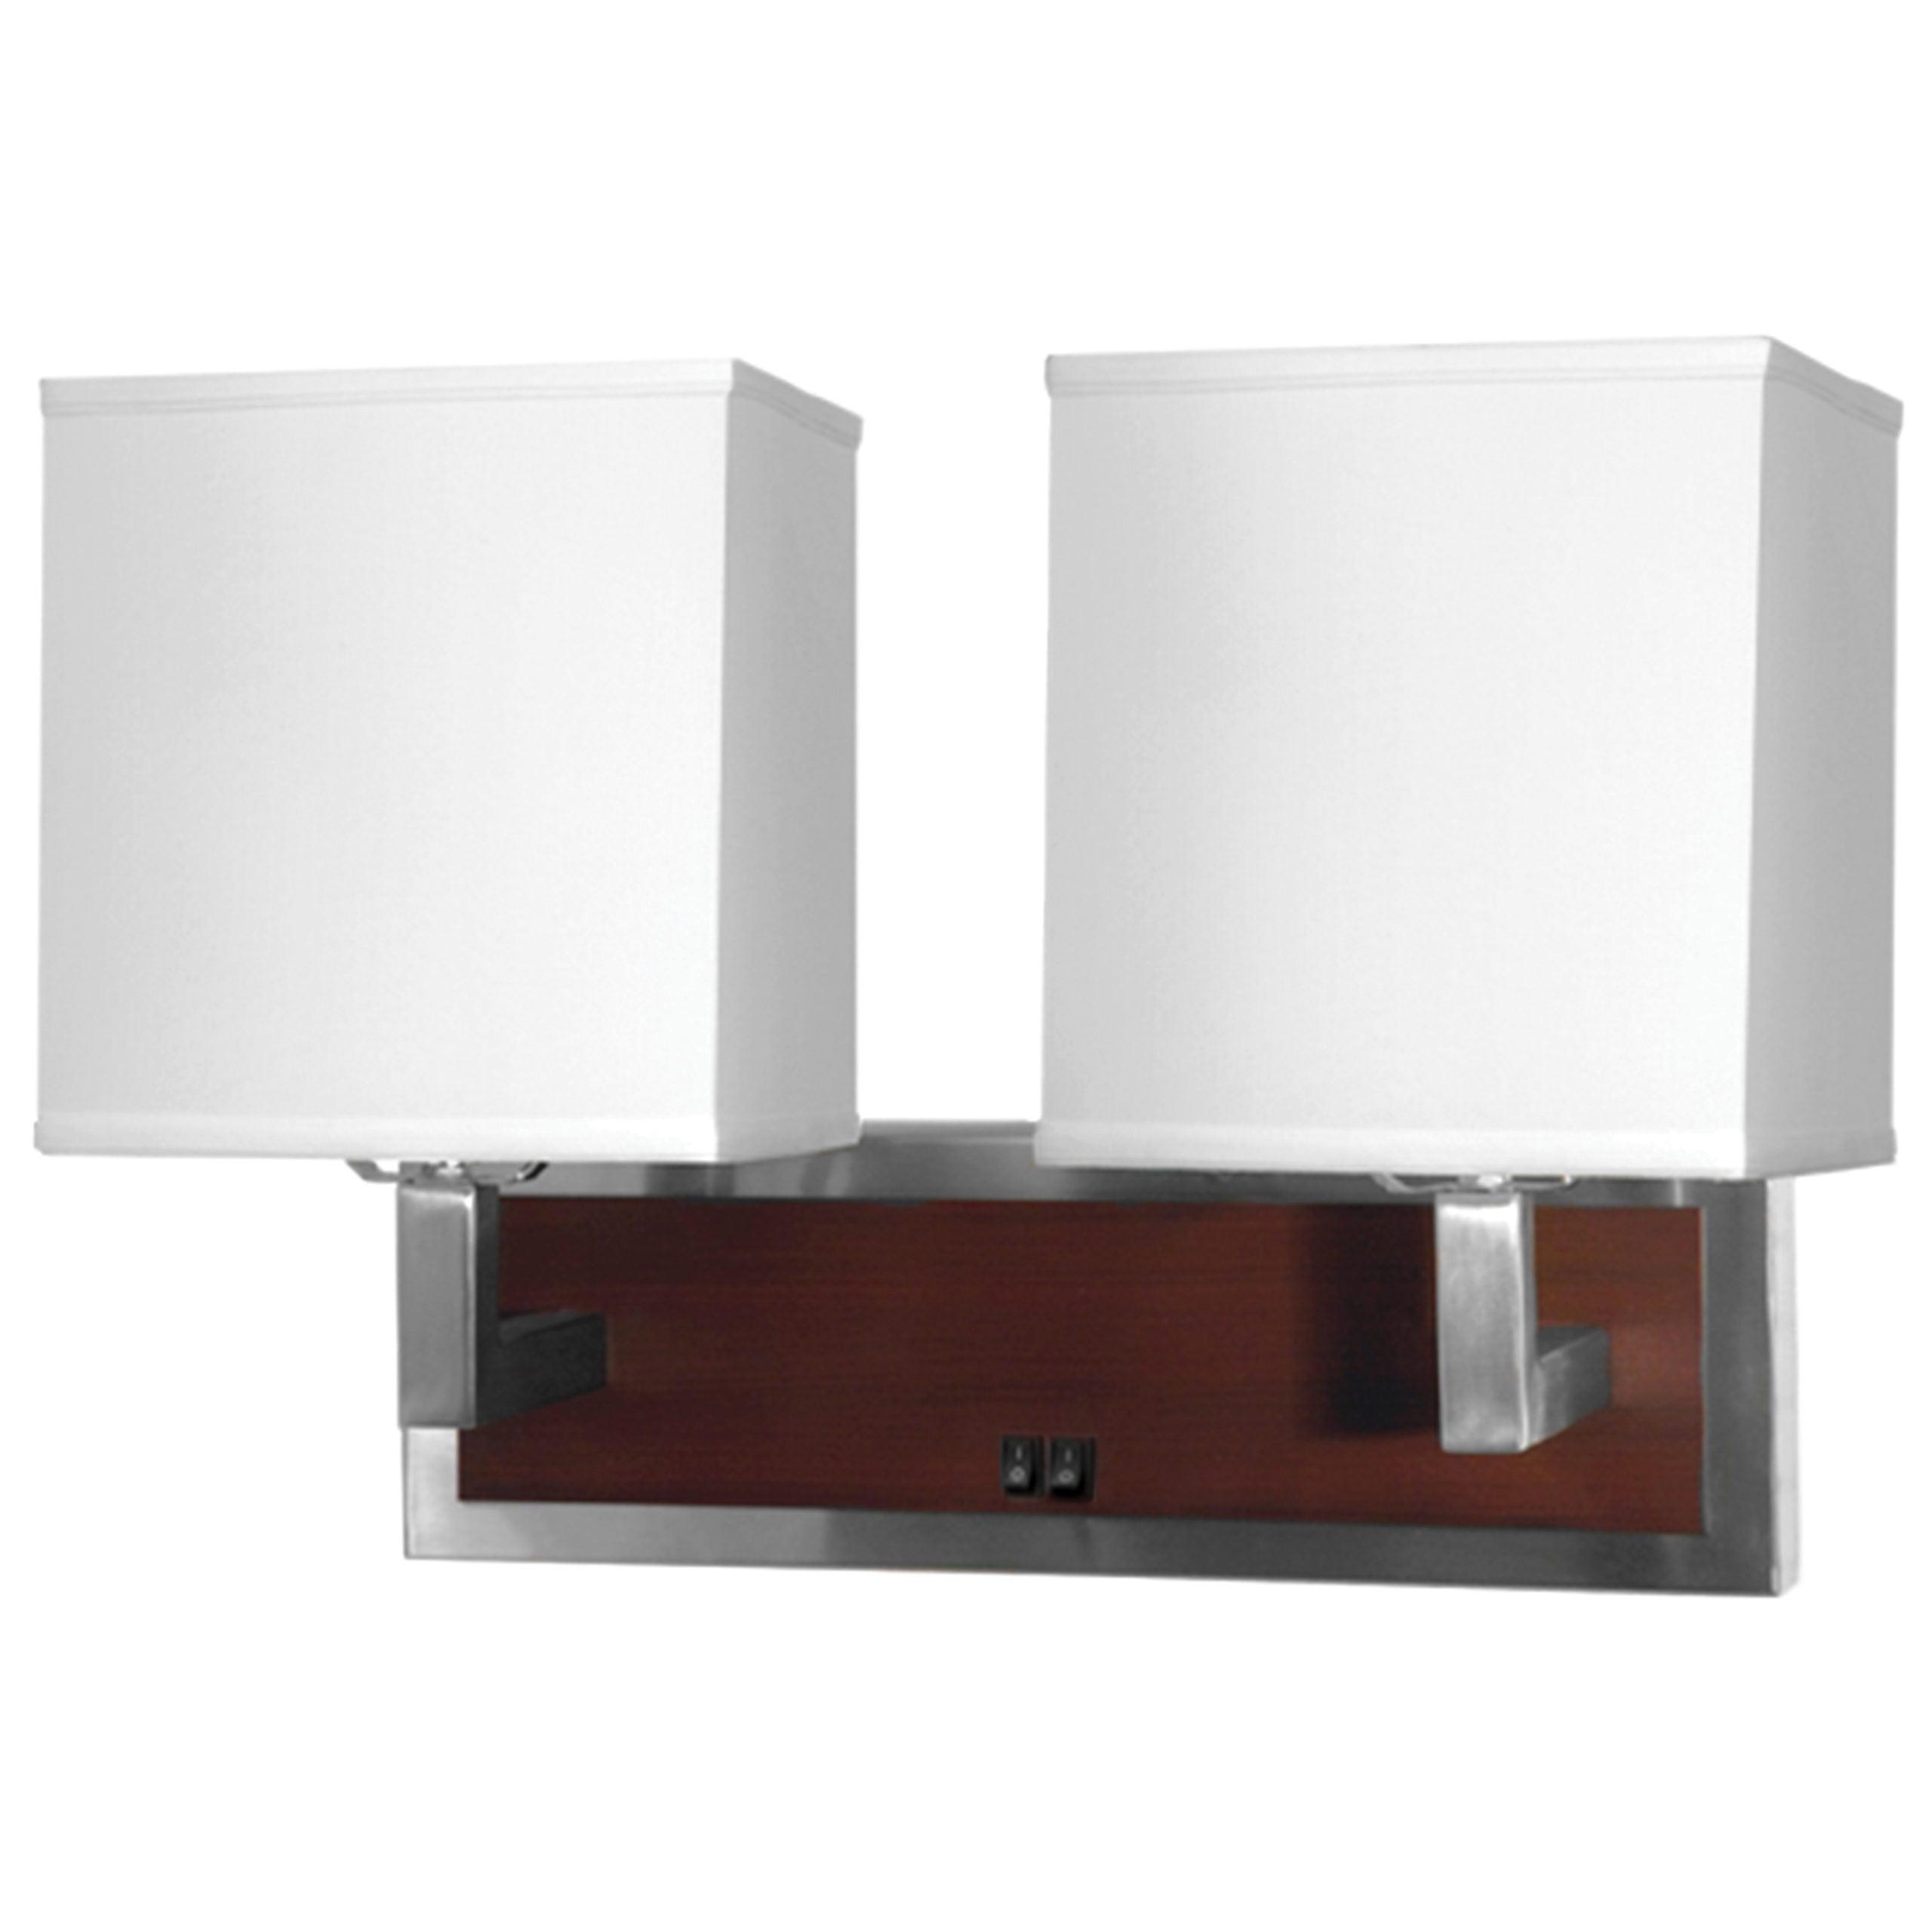 Calibri Double Wall Lamp